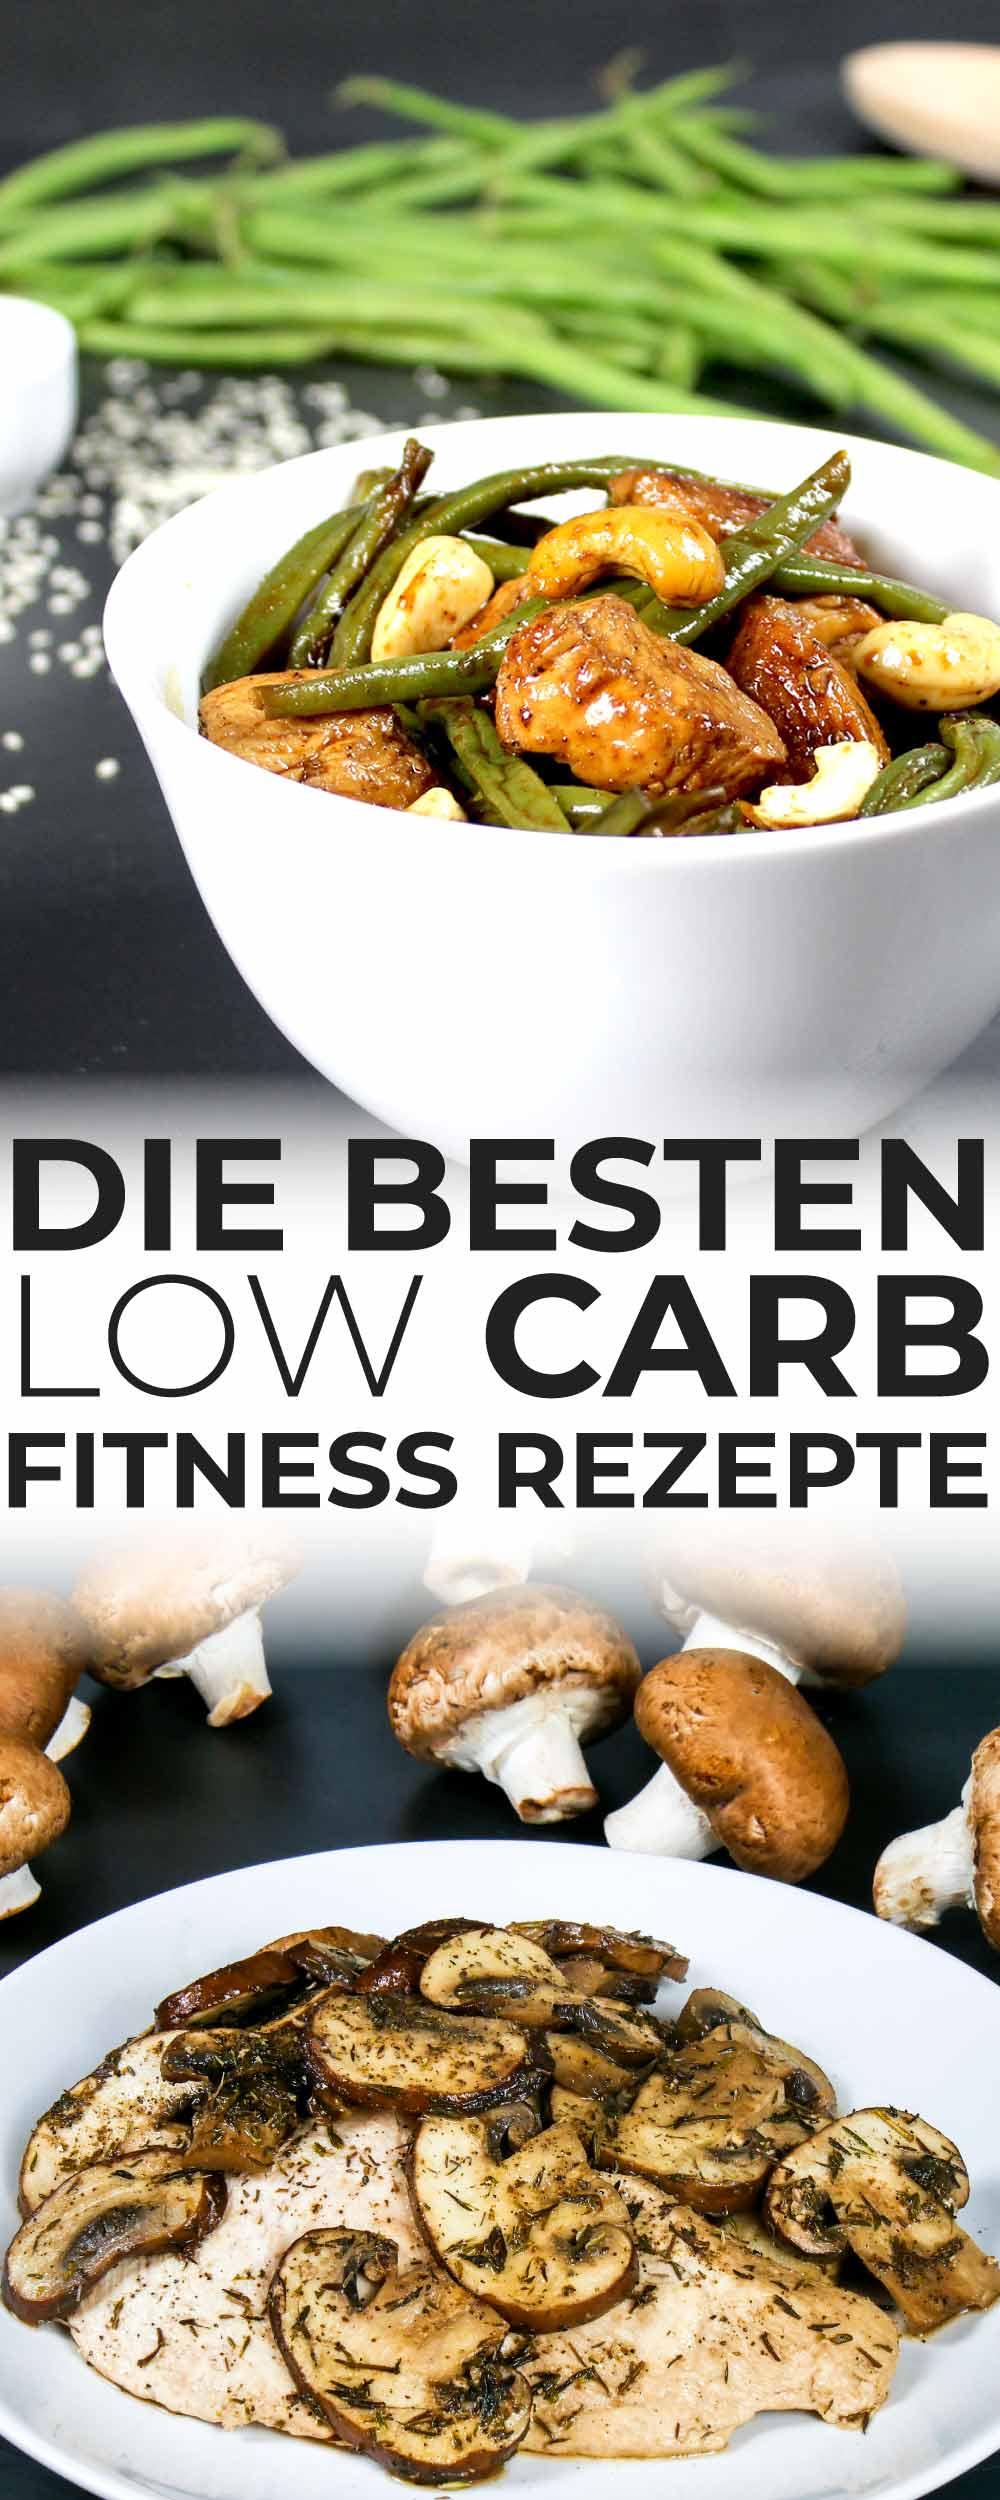 Die besten Low Carb Fitness Rezepte